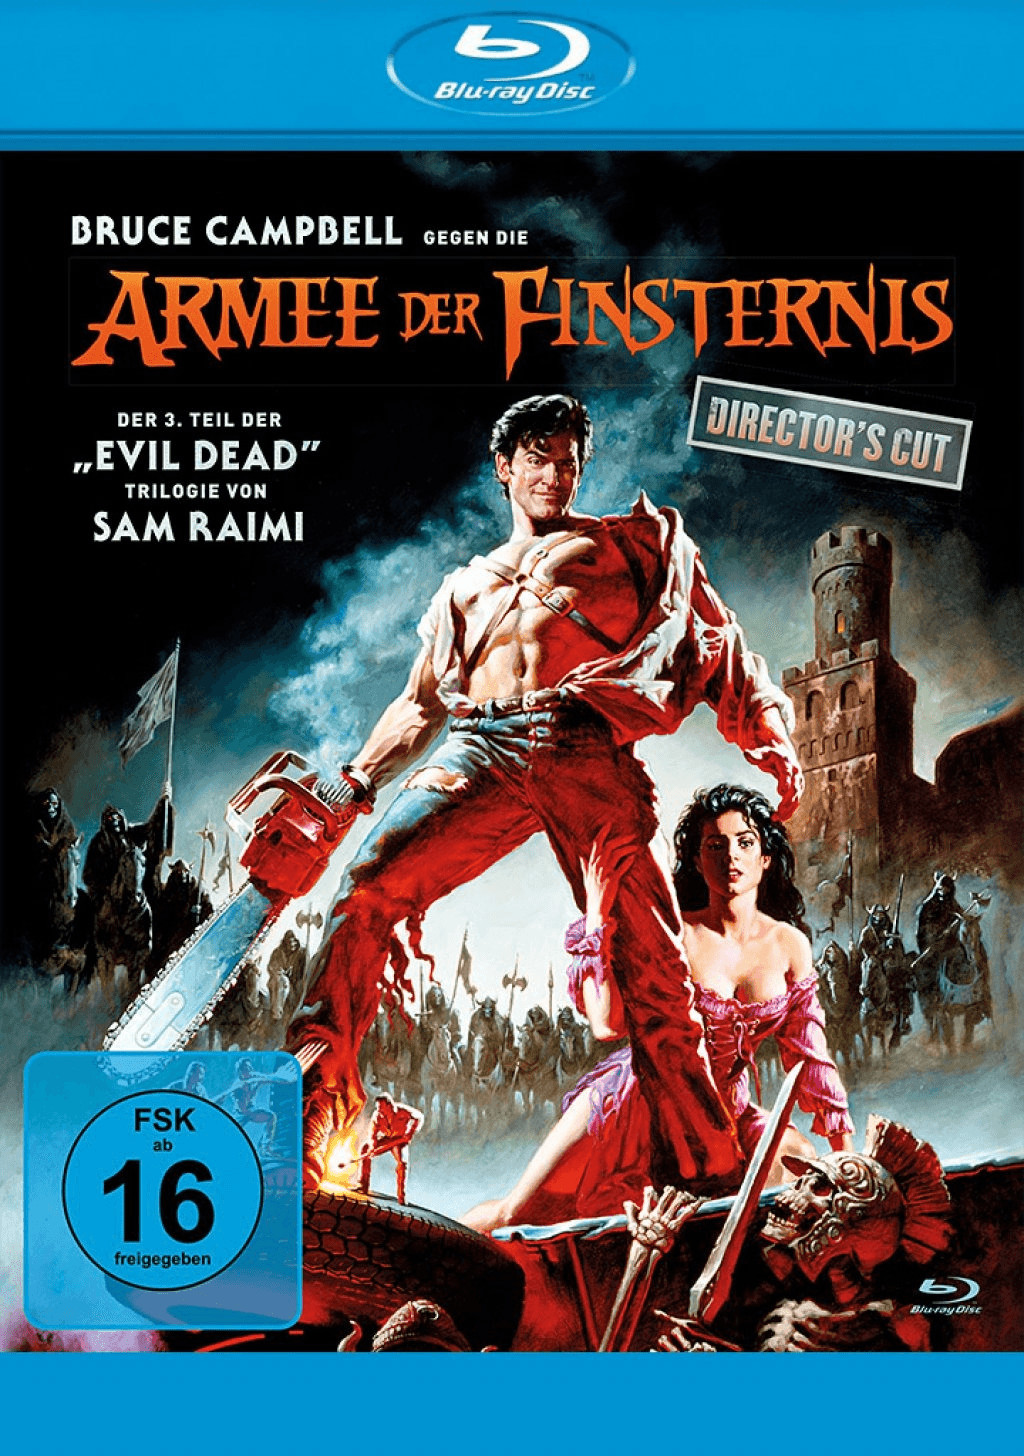 Image of Armee der Finsternis [Director's Cut]